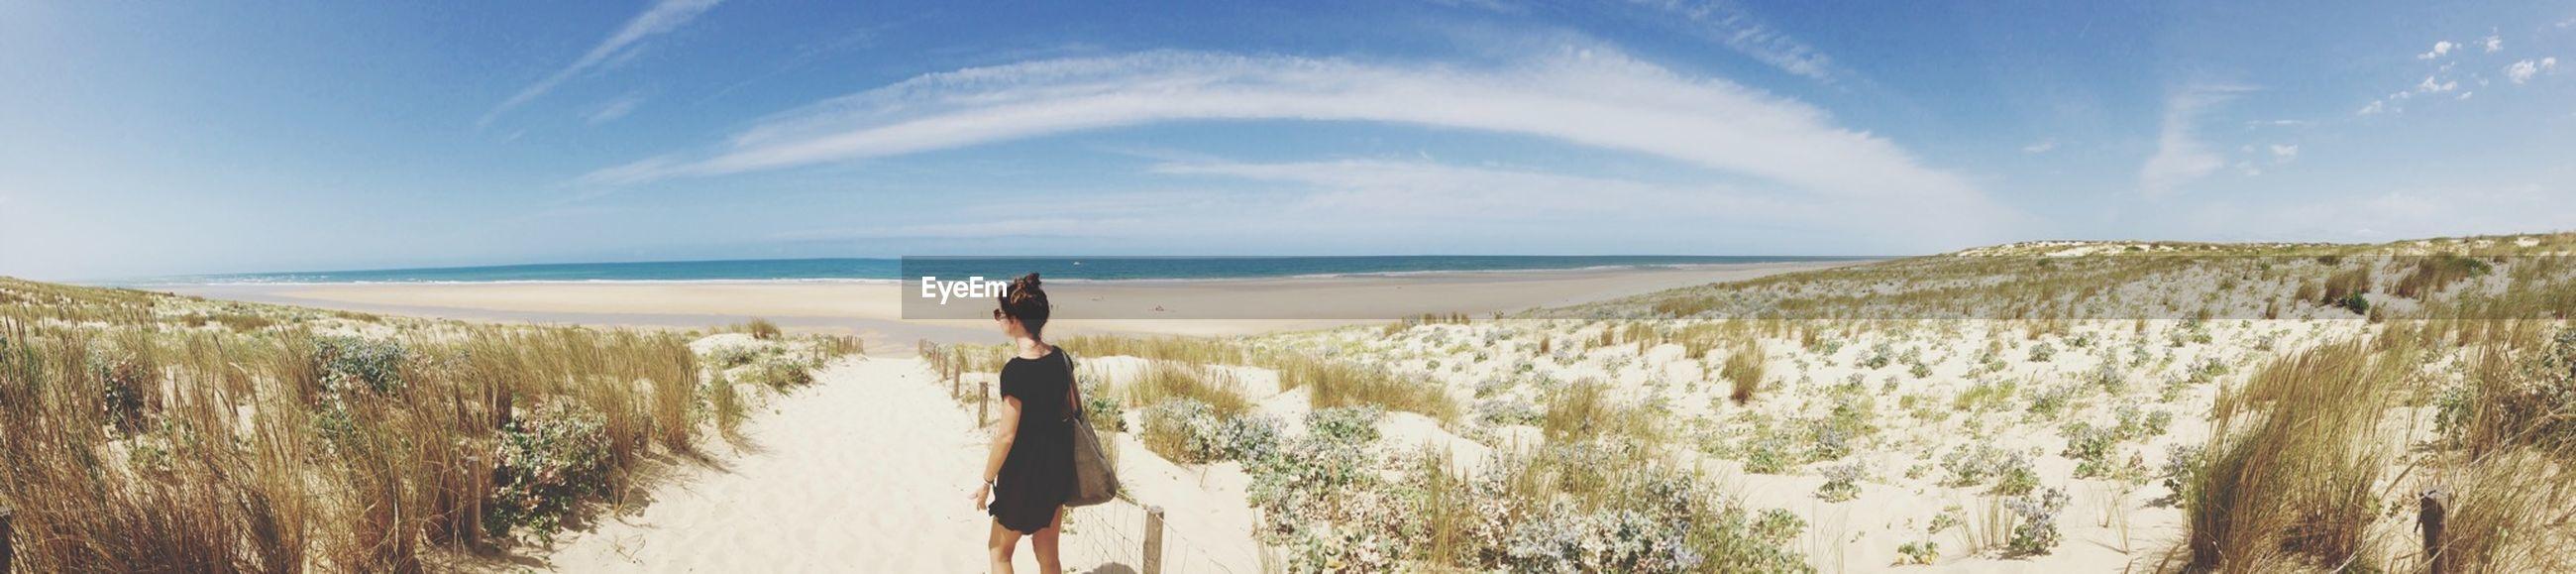 sea, horizon over water, water, beach, sky, tranquil scene, tranquility, scenics, beauty in nature, shore, nature, sand, idyllic, blue, grass, cloud, cloud - sky, remote, coastline, calm